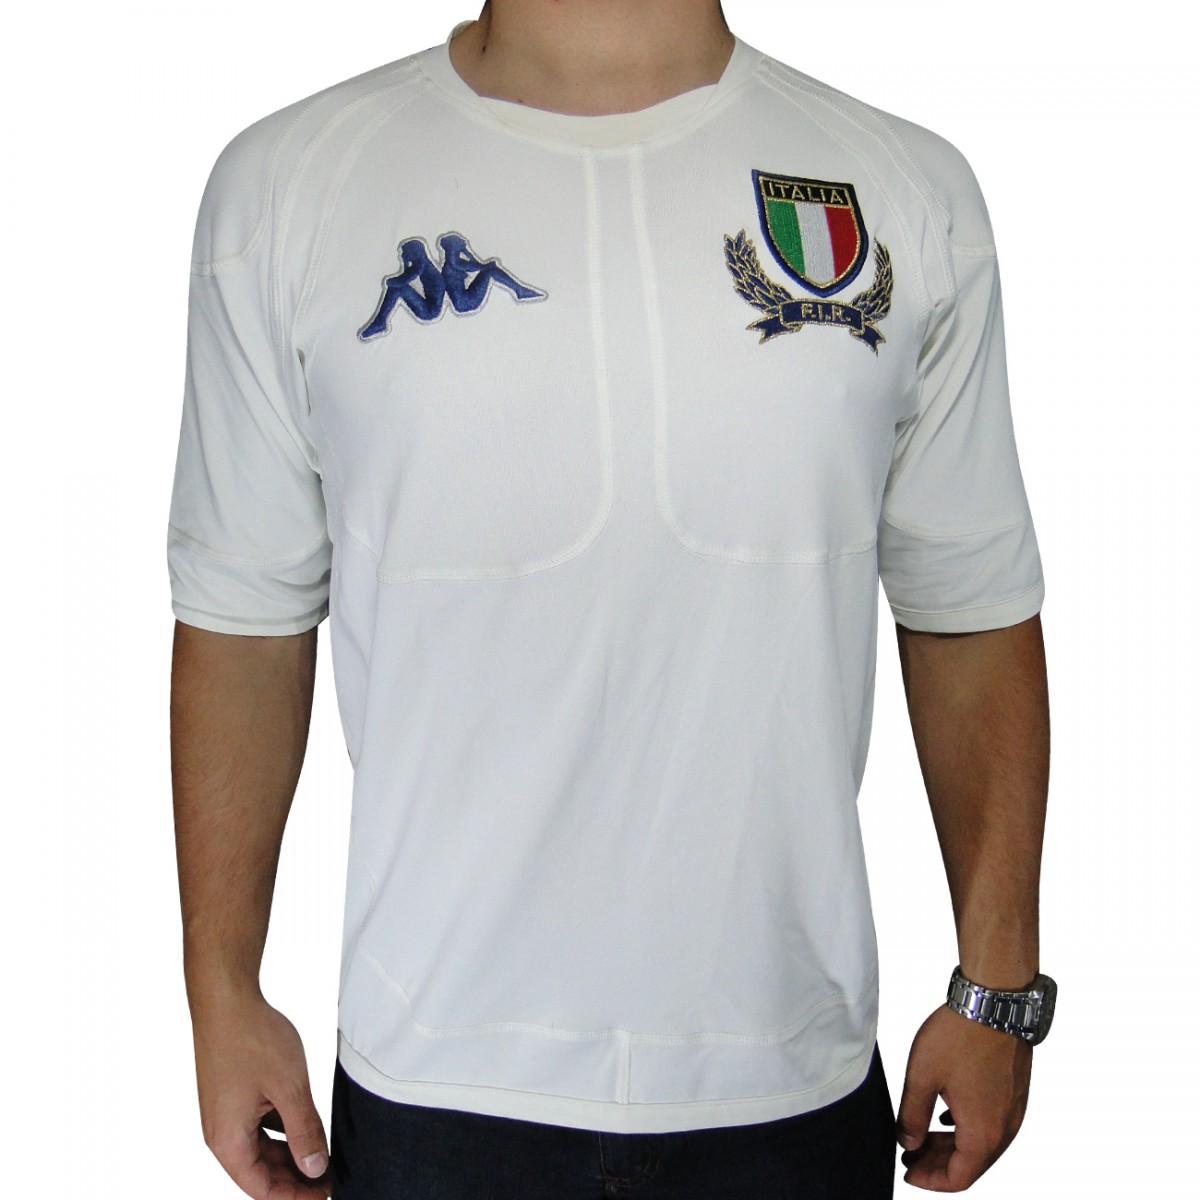 Camisa Kappa Italia Rugby 198824 - Branco - Chuteira Nike 4e1c0acc17700